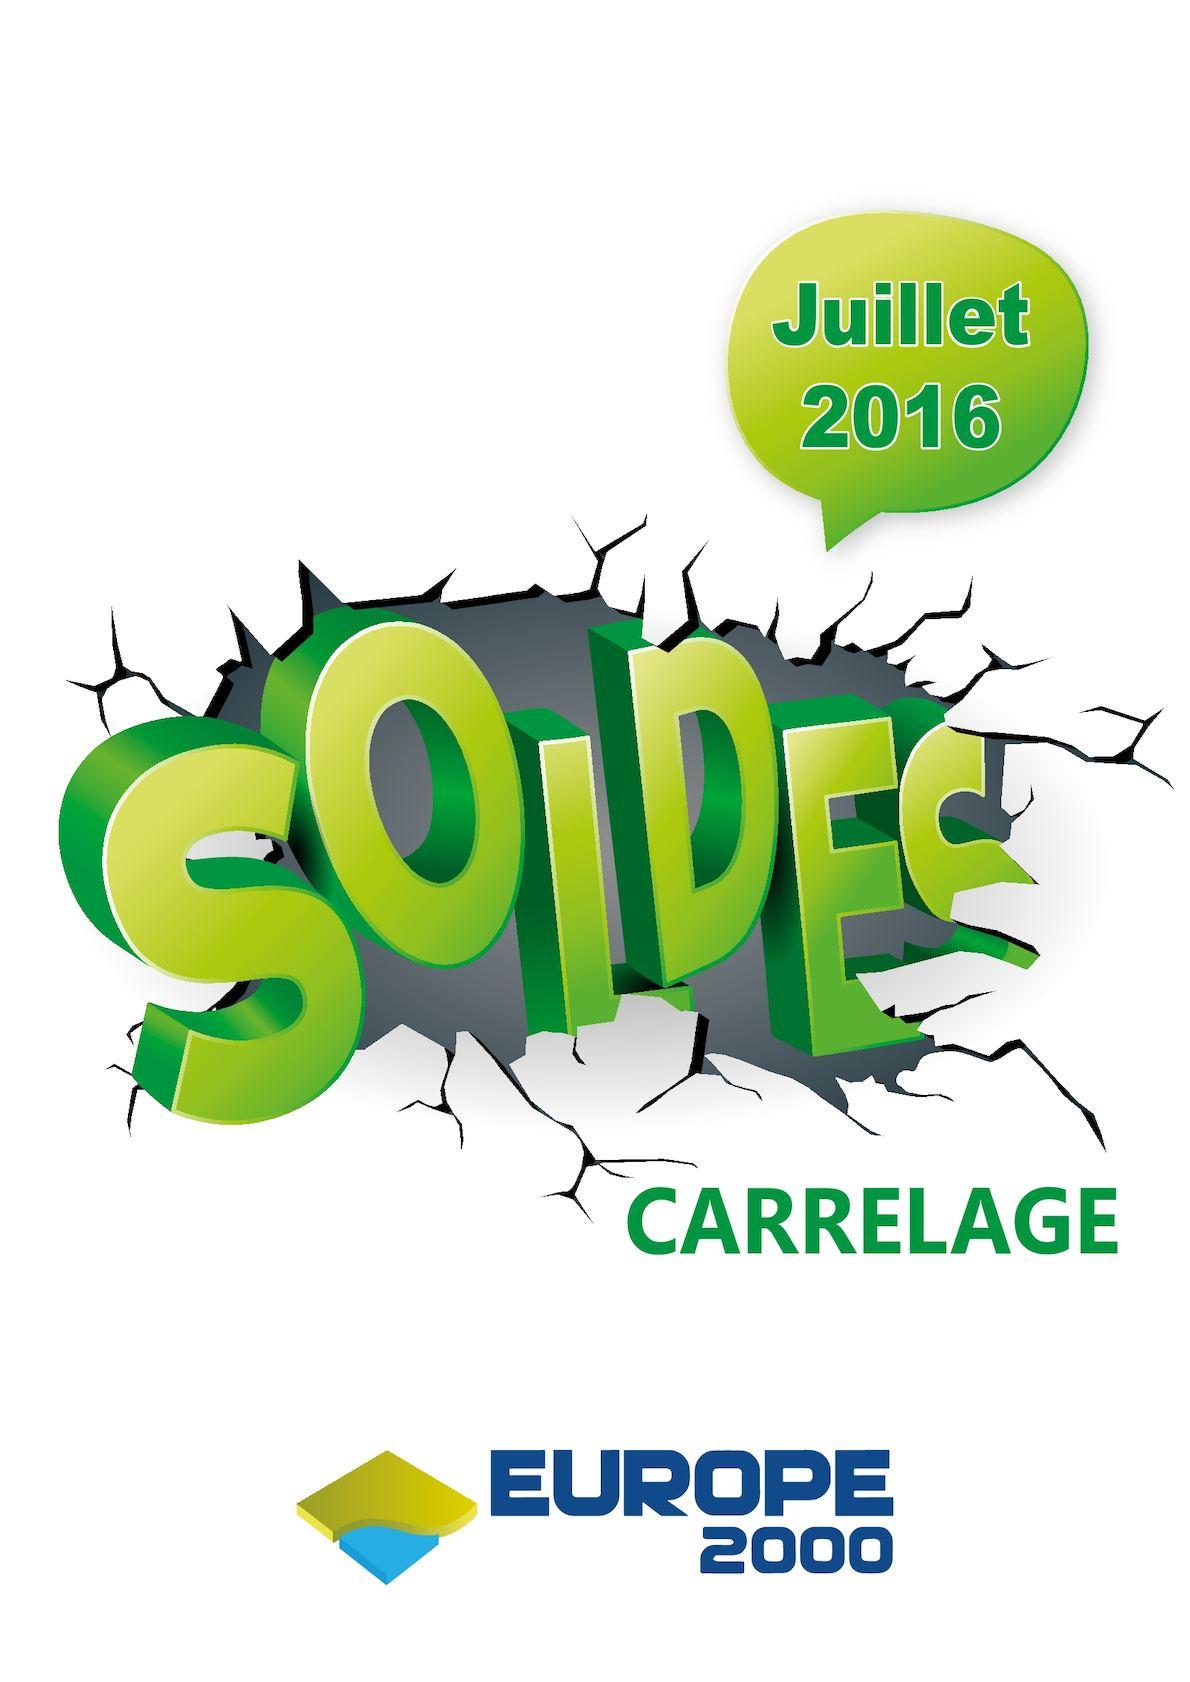 Calam o soldes carrelage europe 2000 juillet 2016 for Europe 2000 carrelage